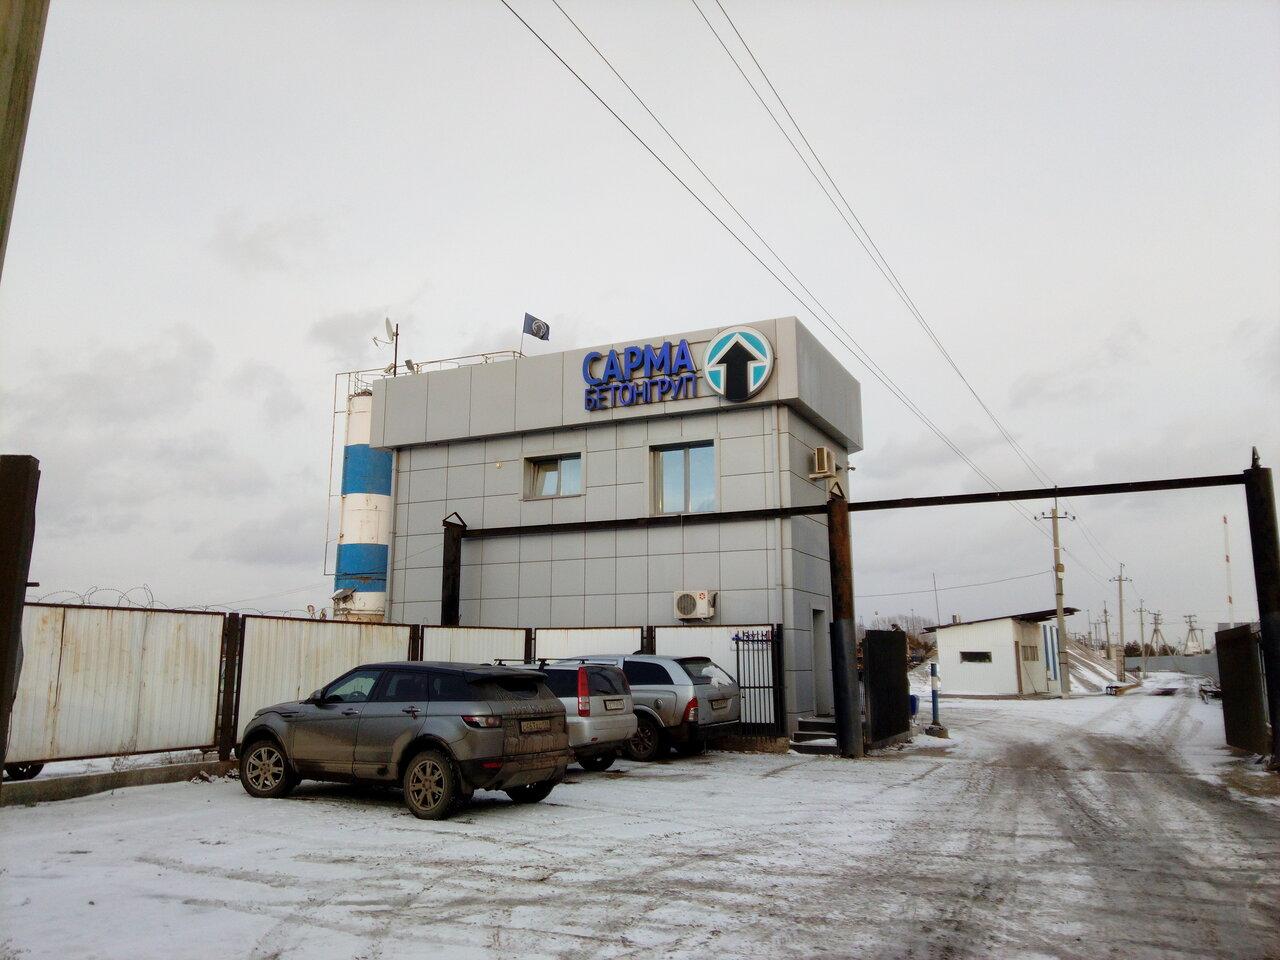 Сарма бетон иркутск лдсп по бетону